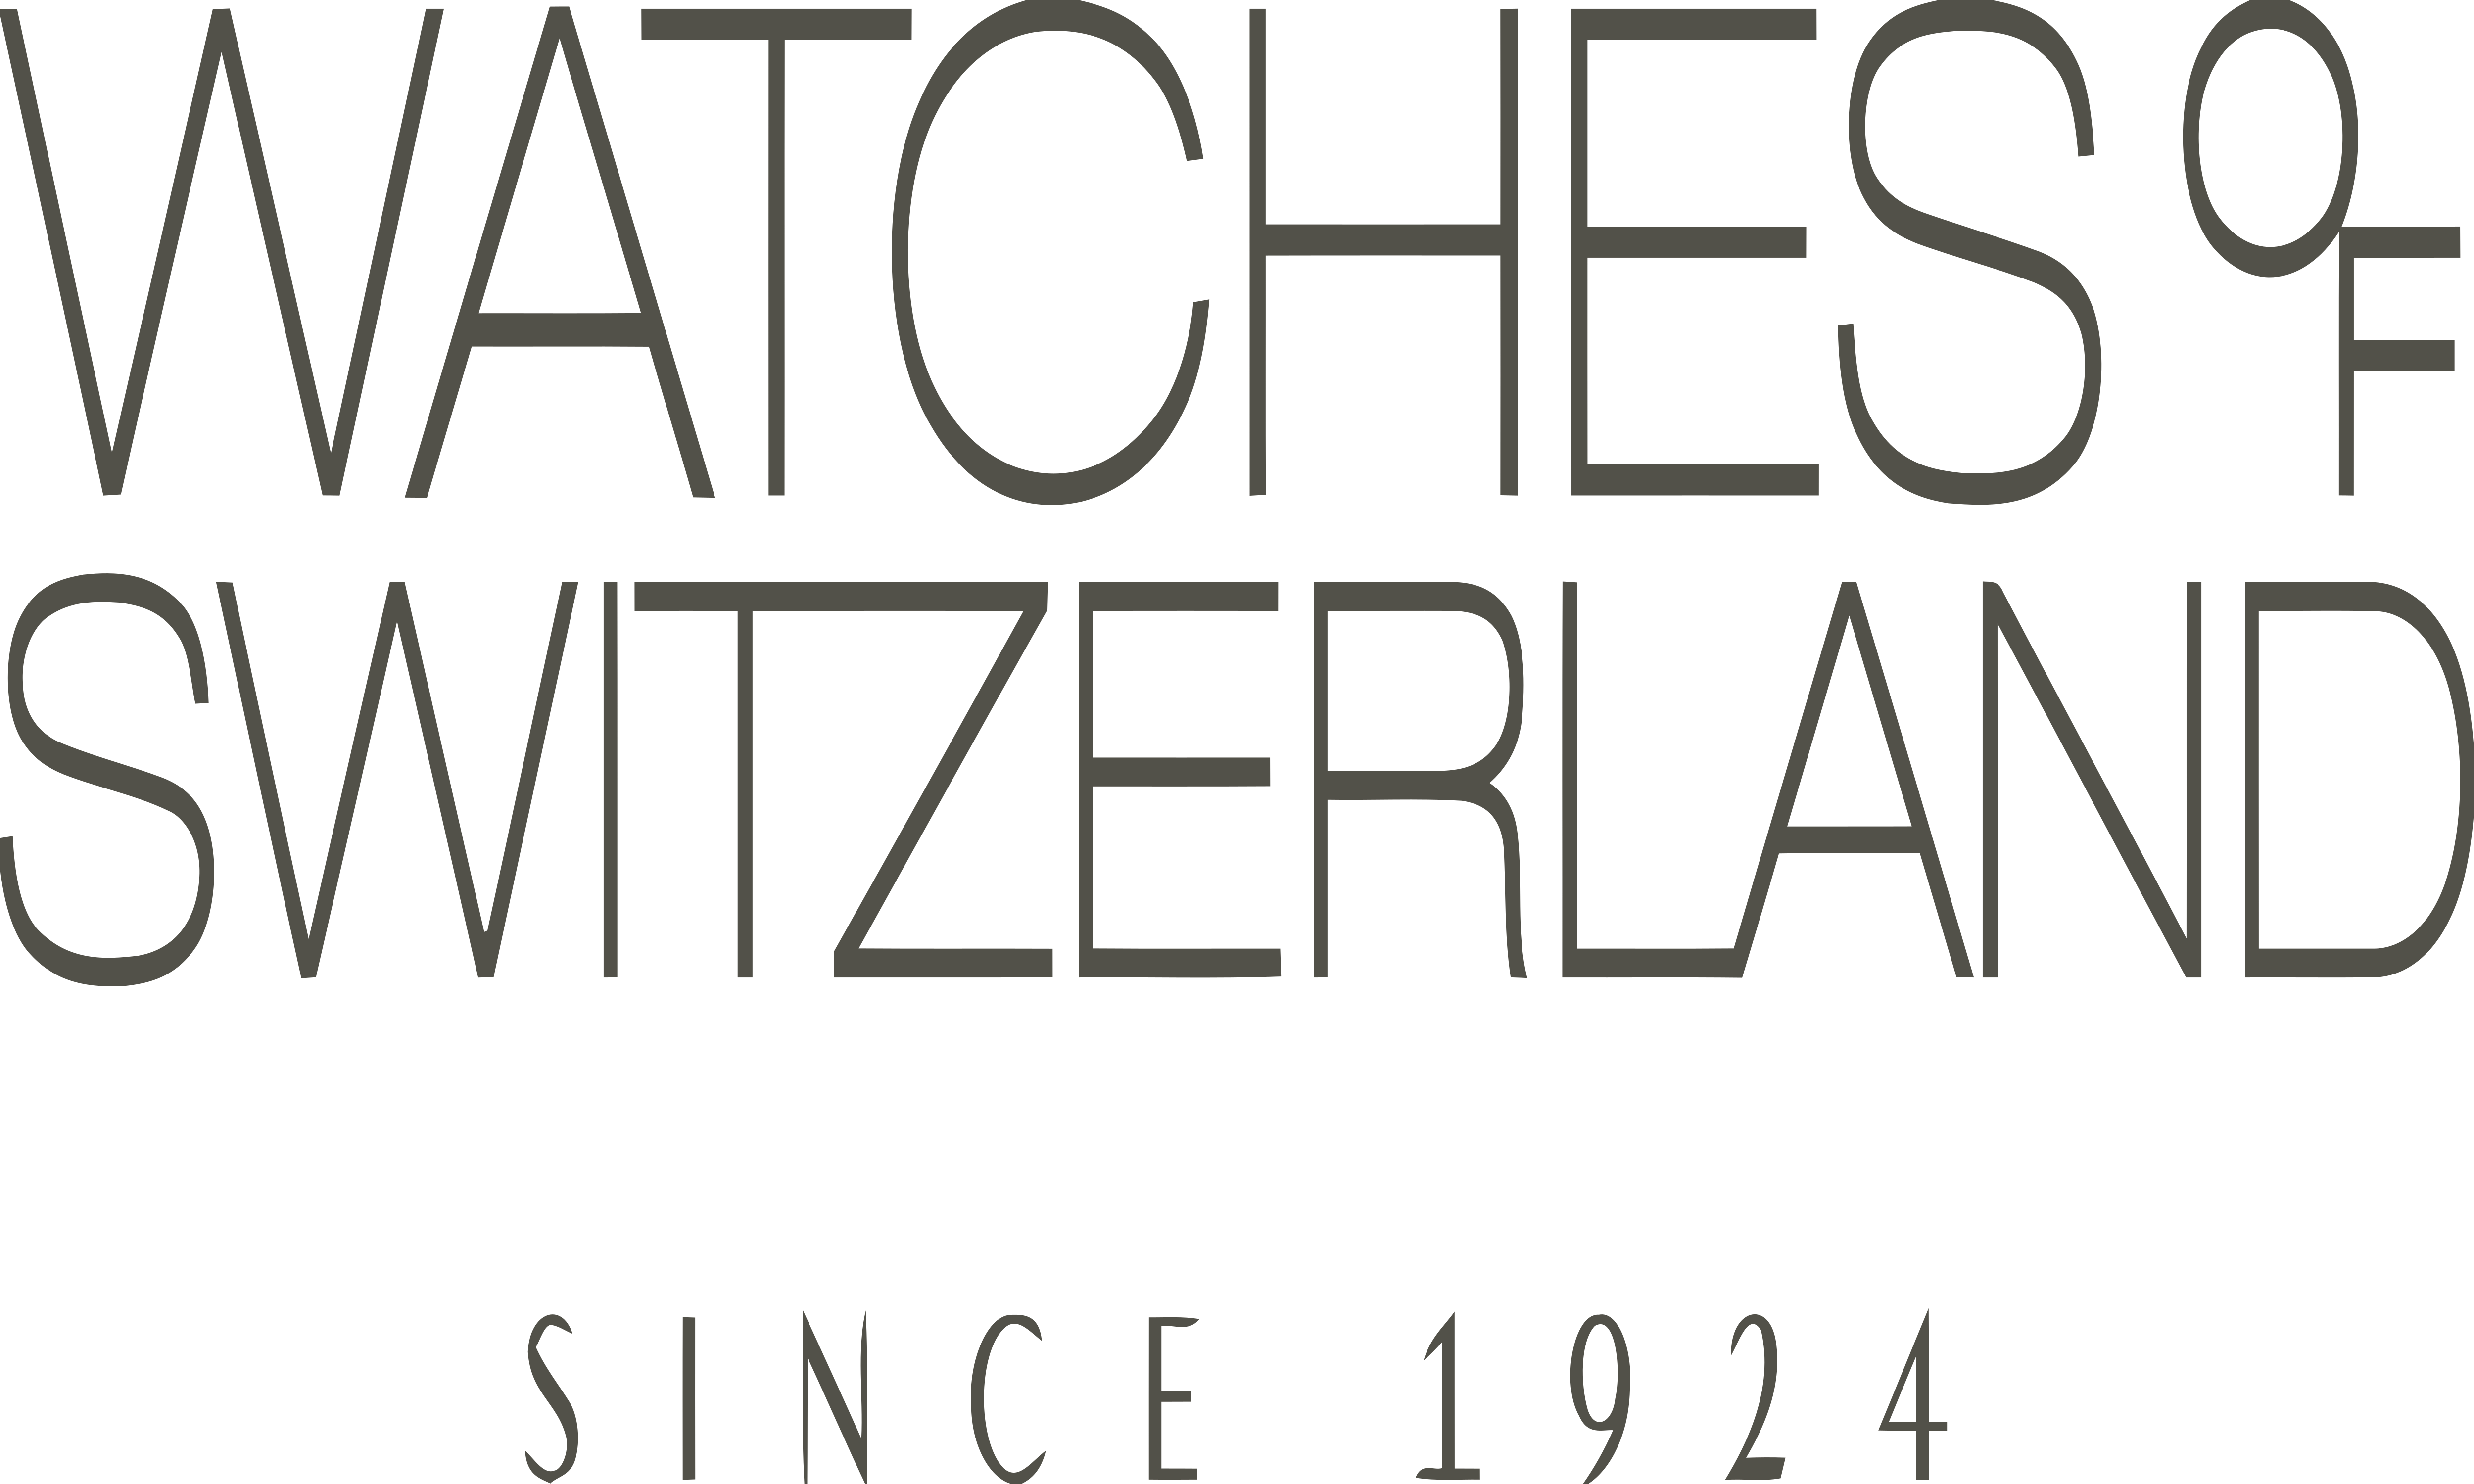 Watches of Switzerland – Logos Download